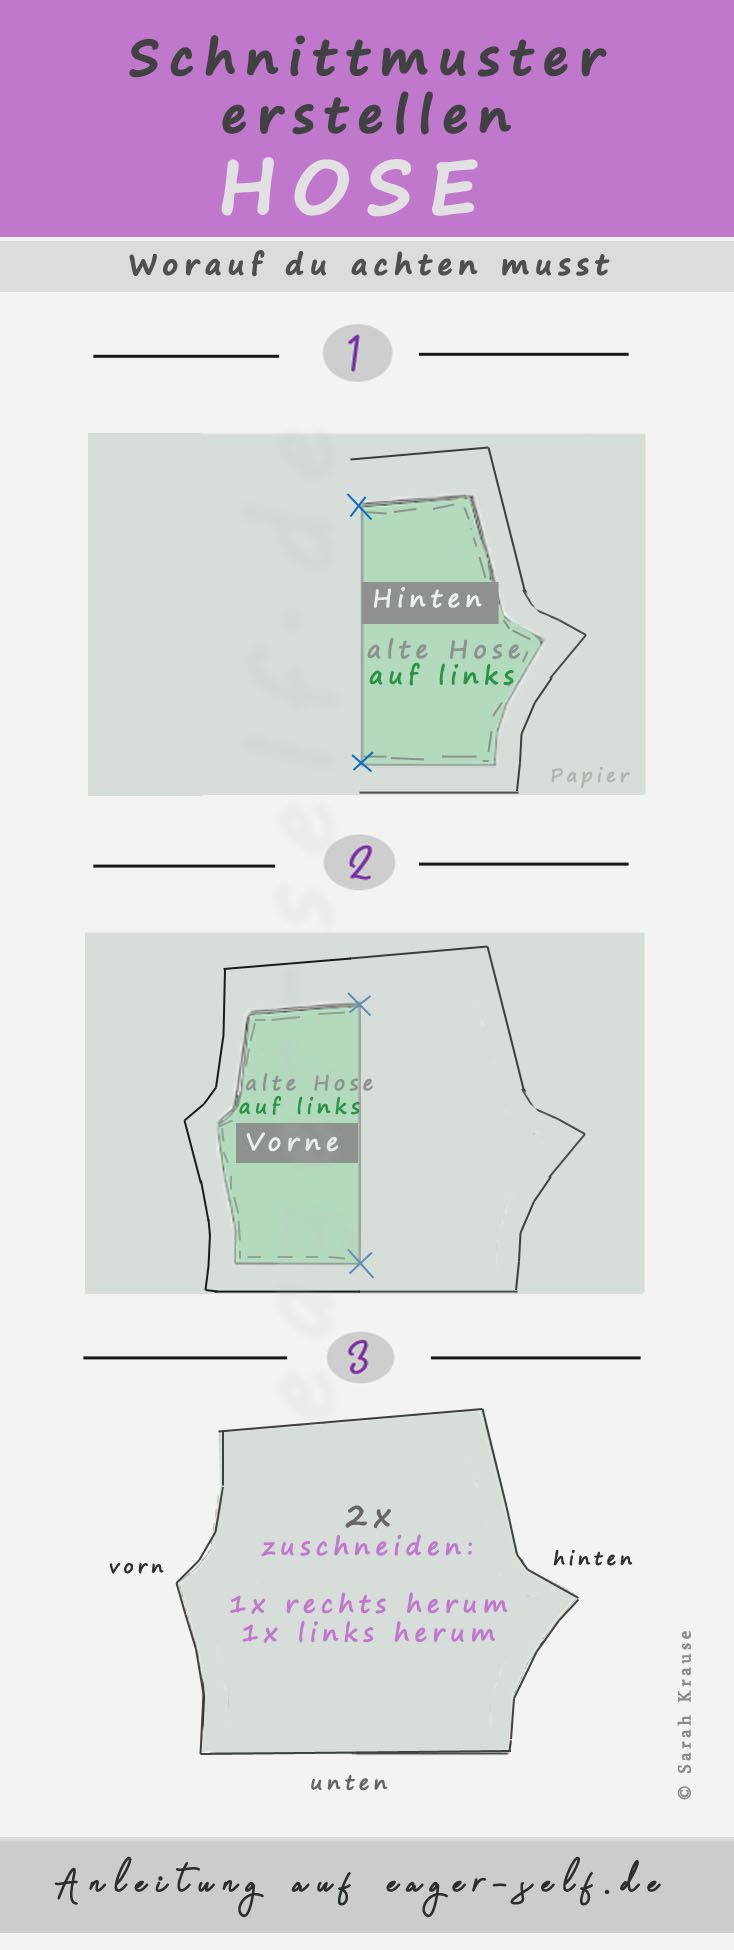 Schnittmuster aus deiner Lieblingshose kopieren - So geht's